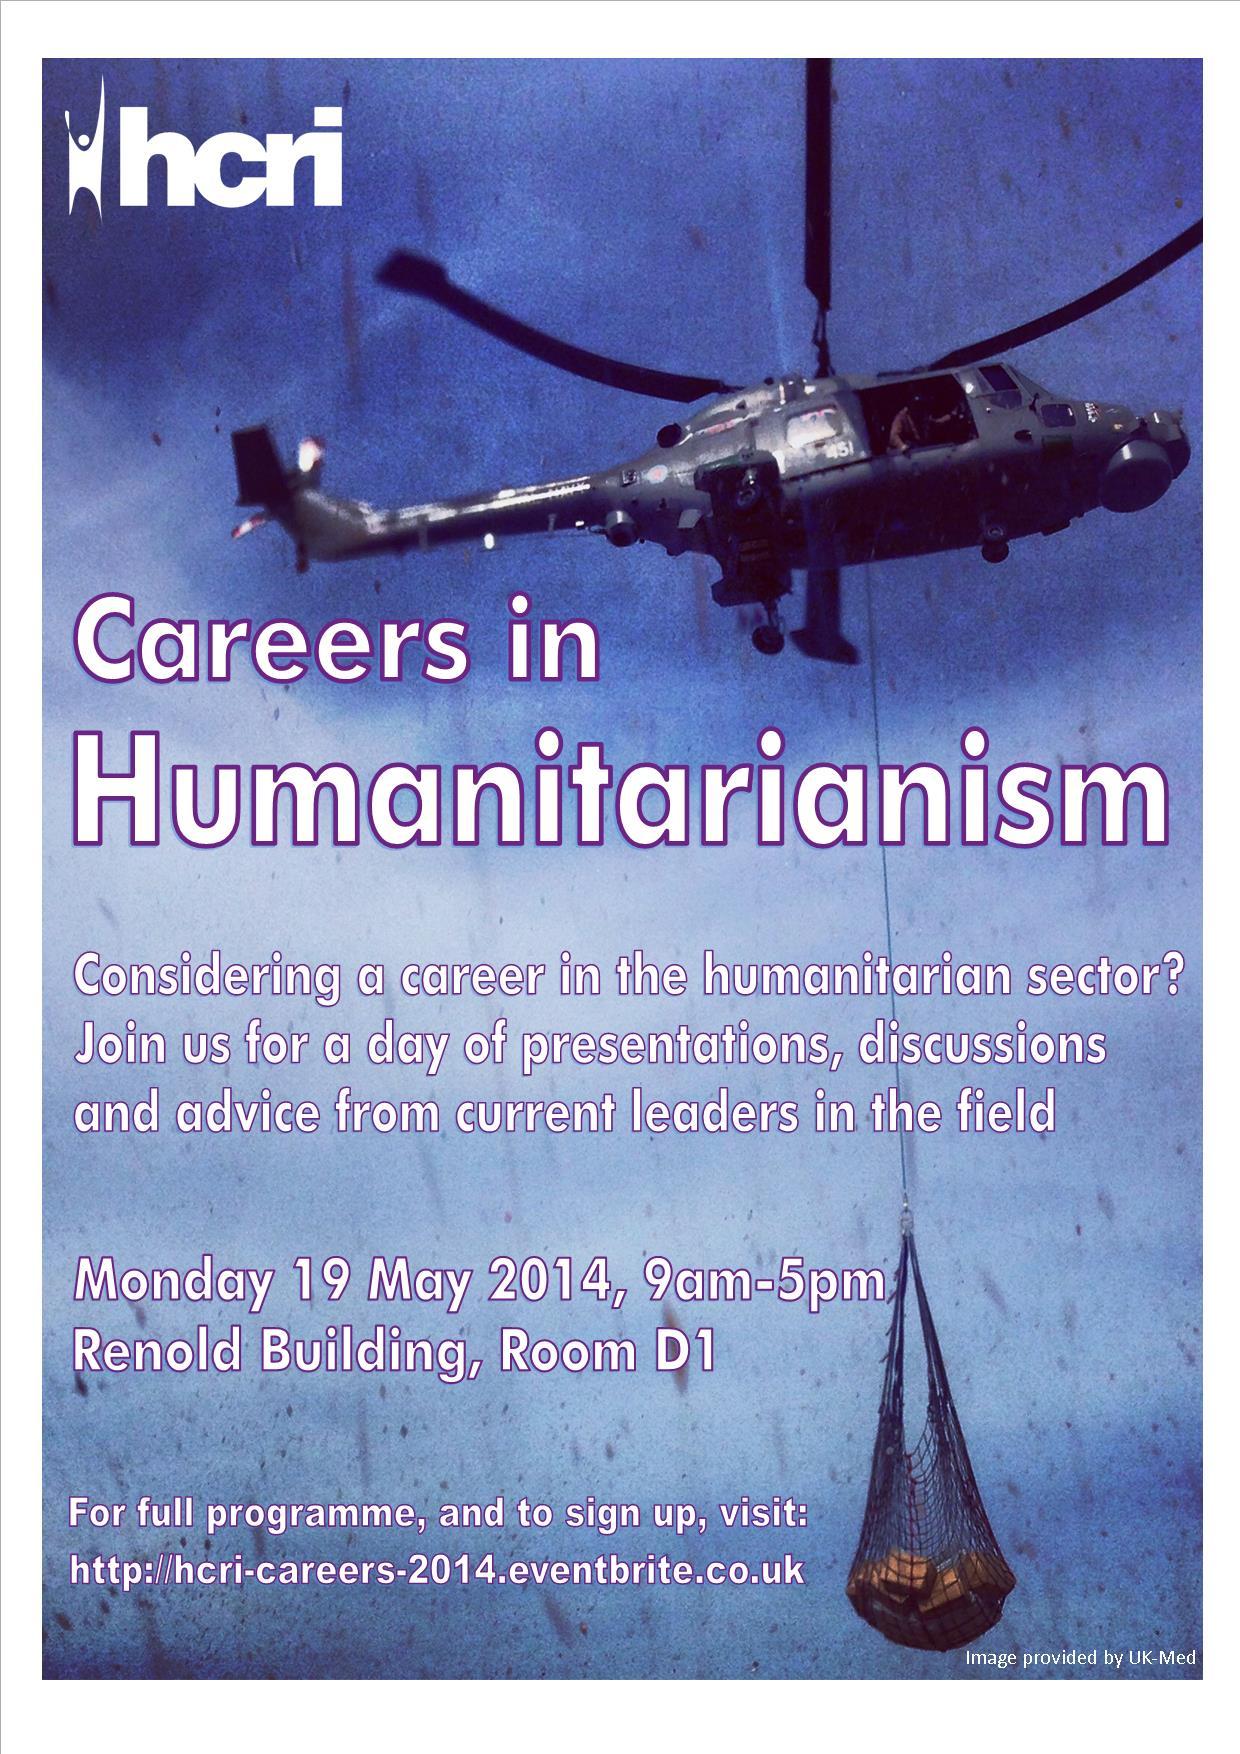 Careers in Humanitarianism Poster, 19 May 2014